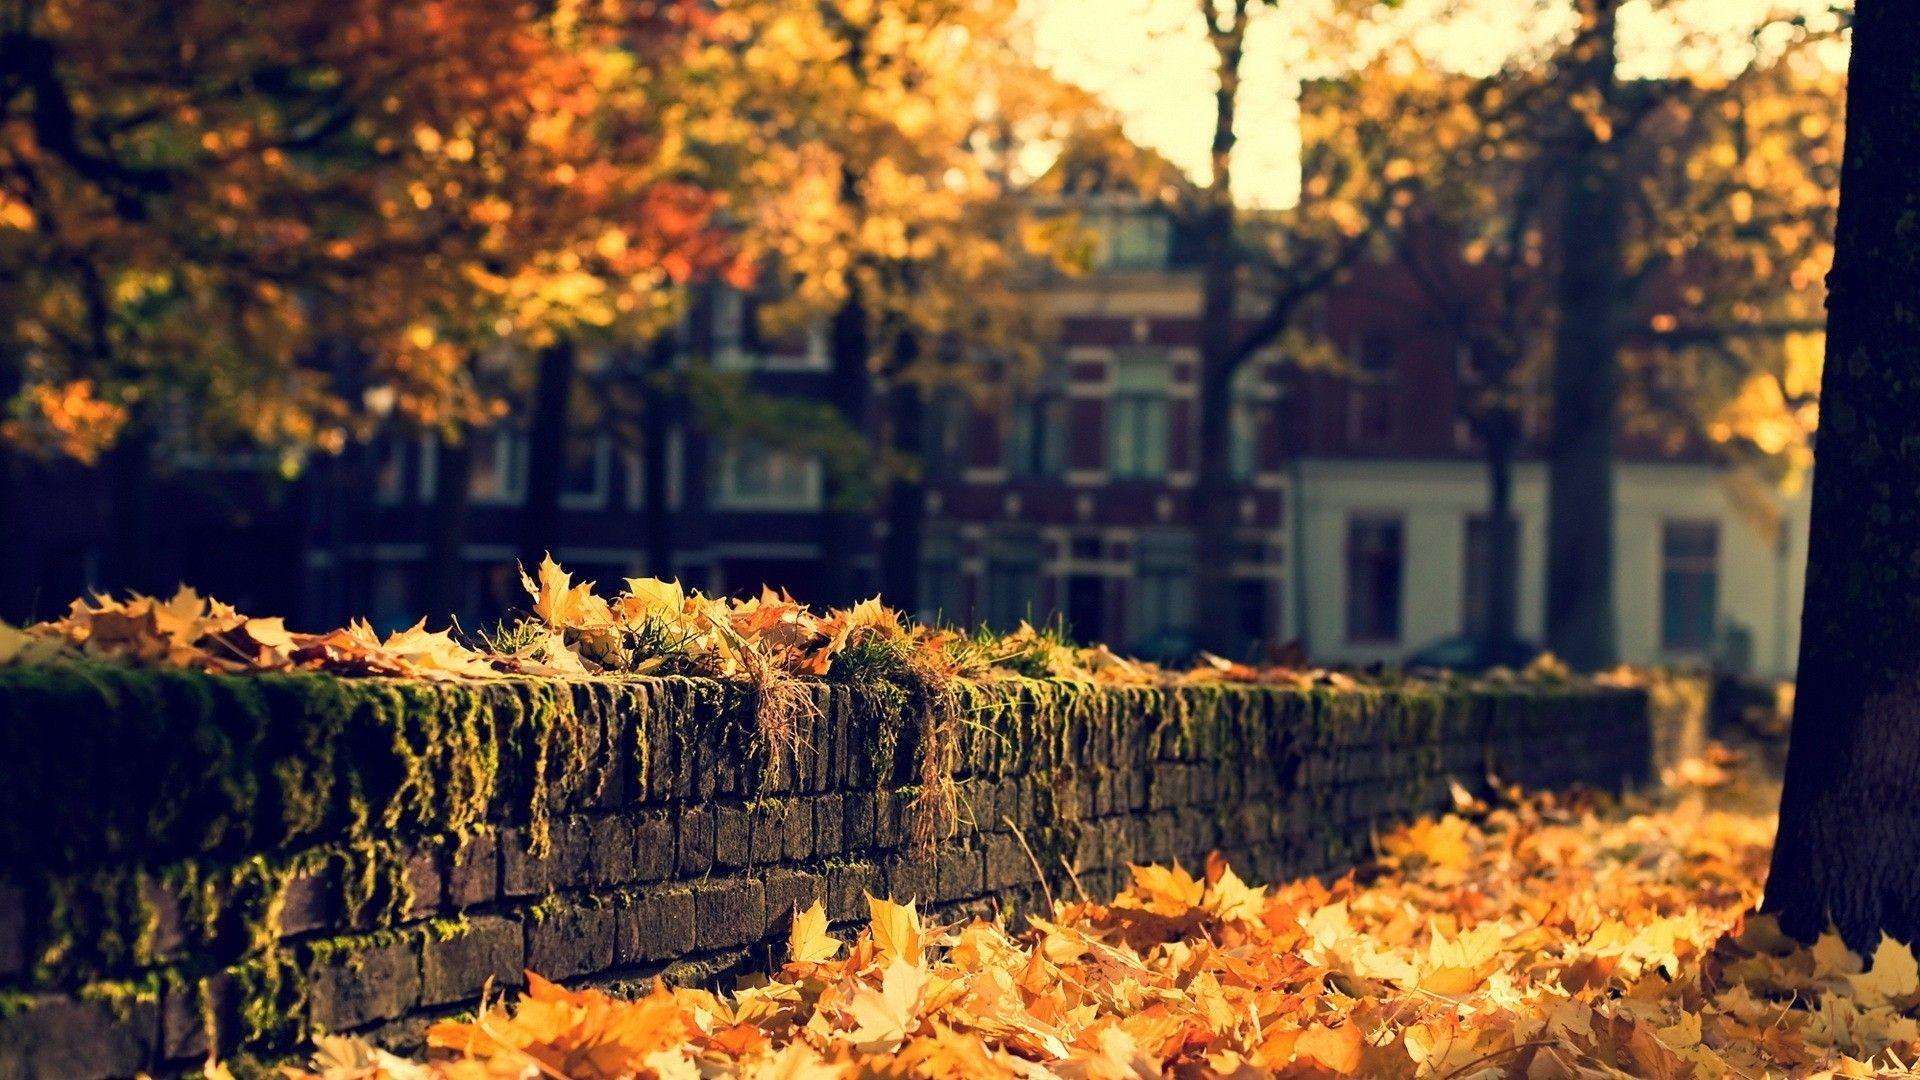 Fall Desktop Backgrounds 13587 – HD Wallpapers Site